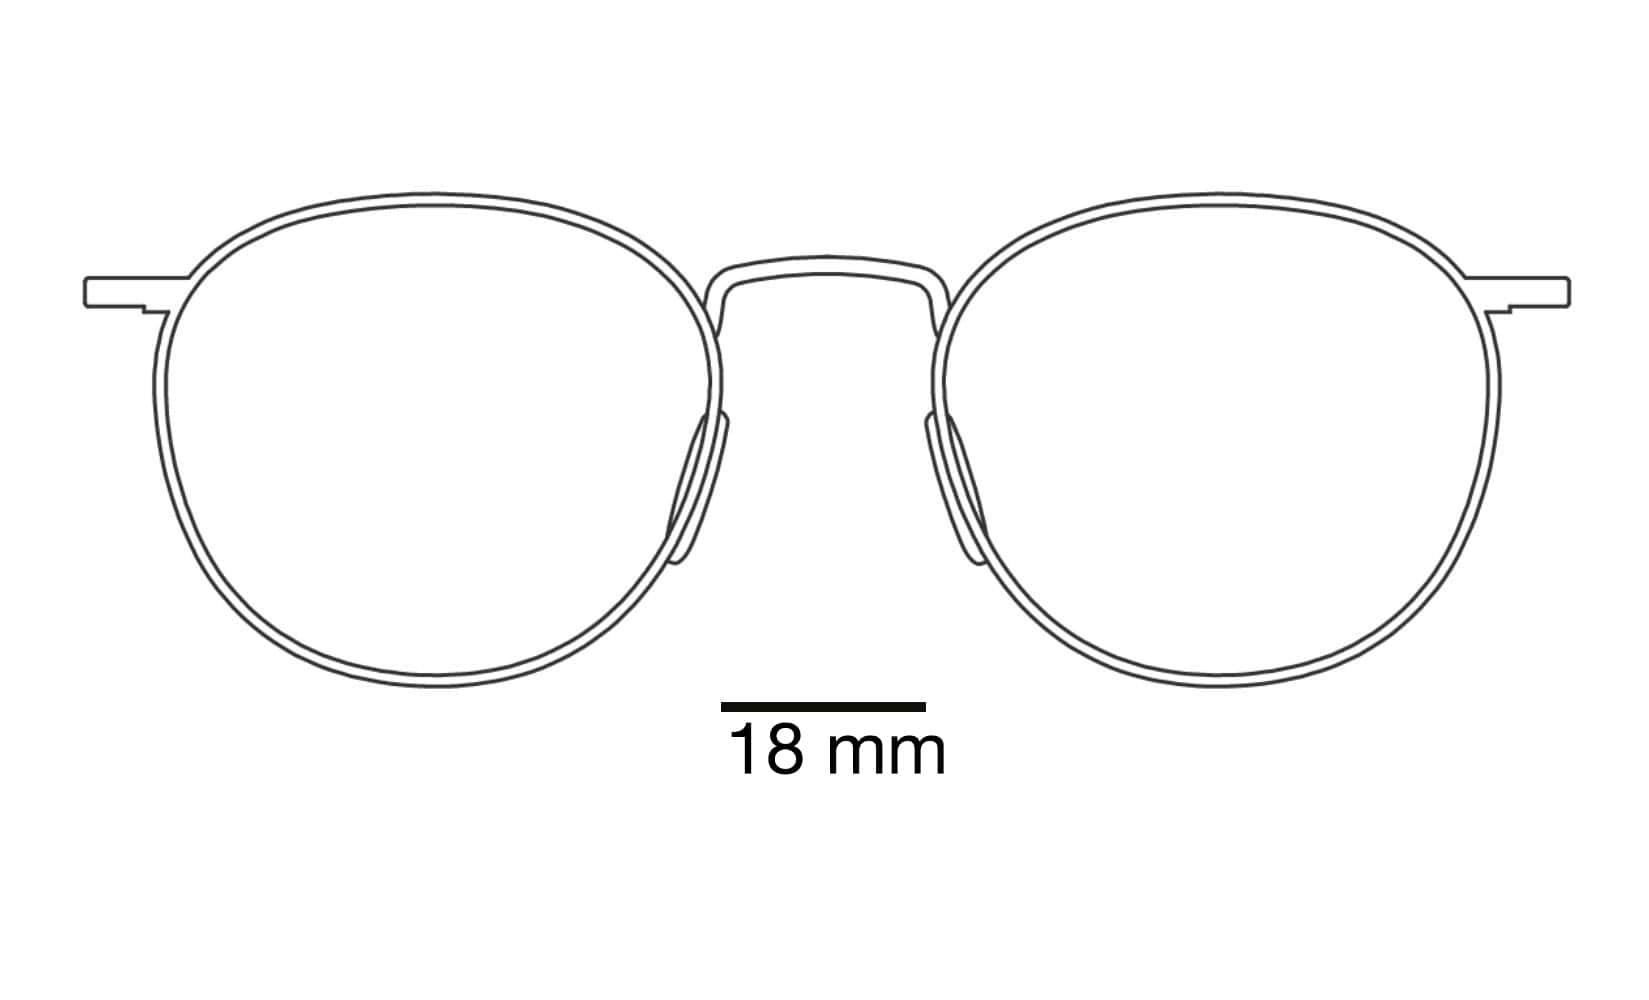 breedte neusbrug zonnebril